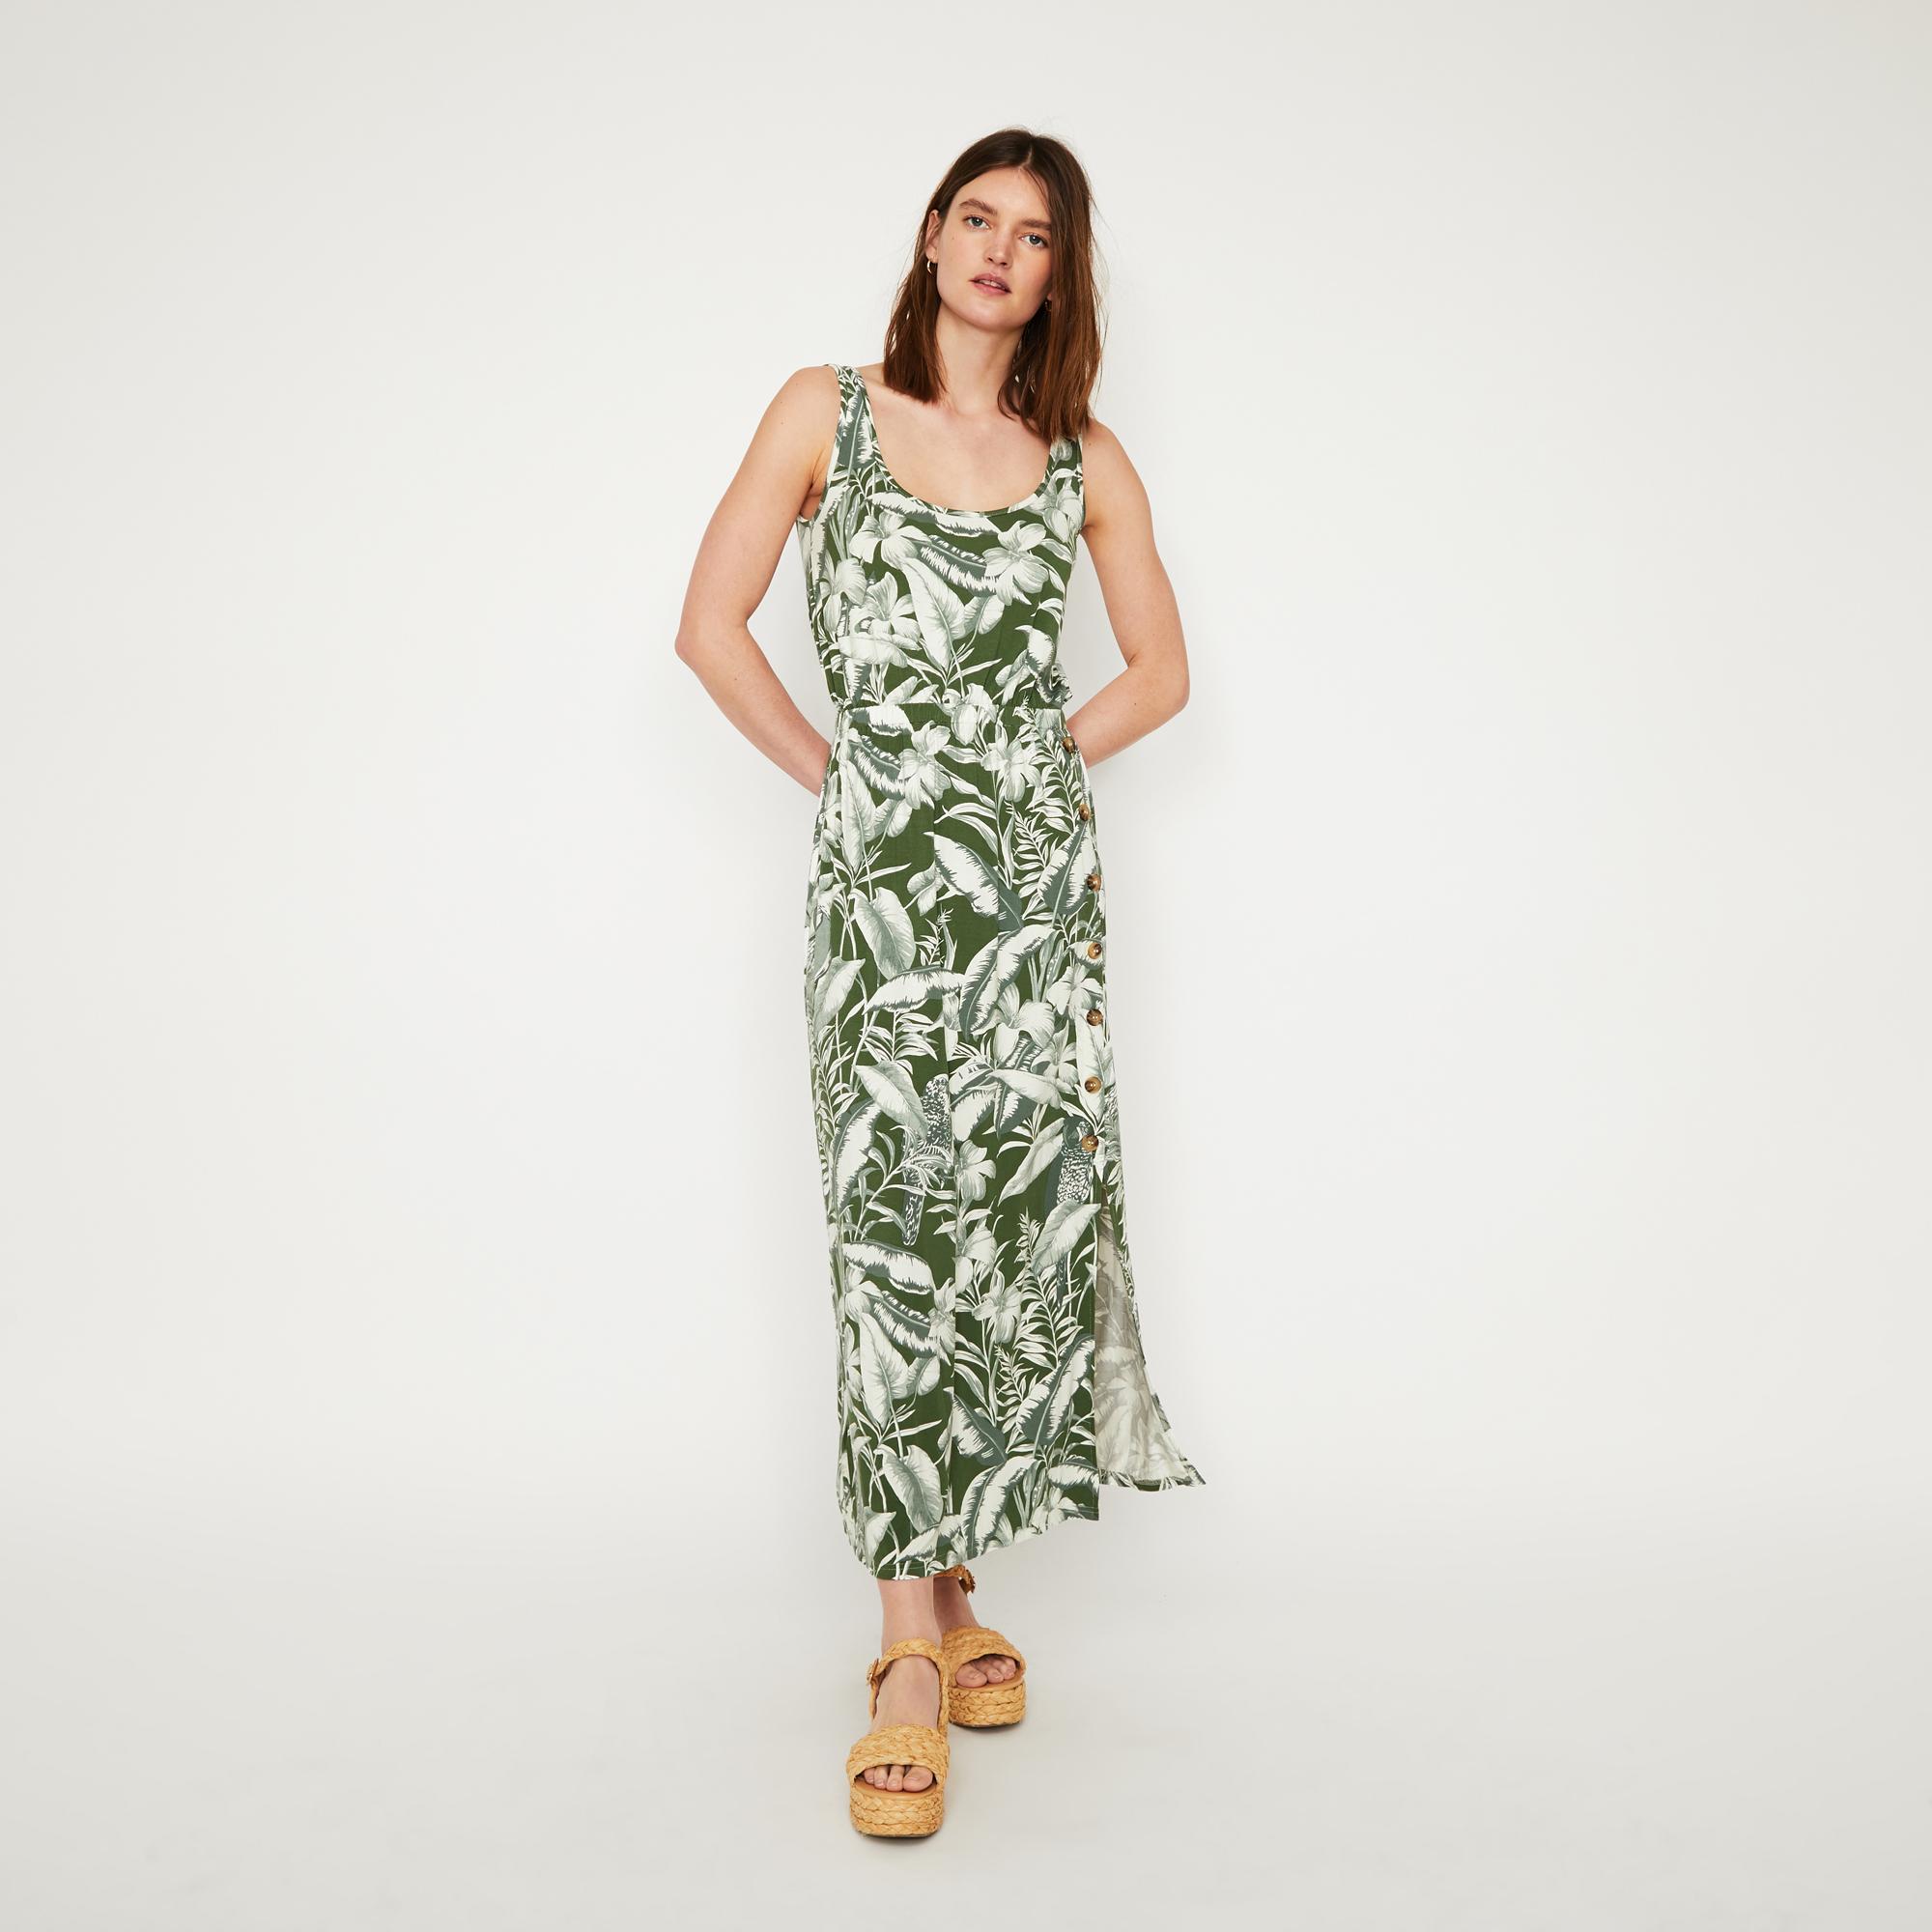 f98f5f9f55 Warehouse Tropical Parrot Maxi Dress in Green - Lyst